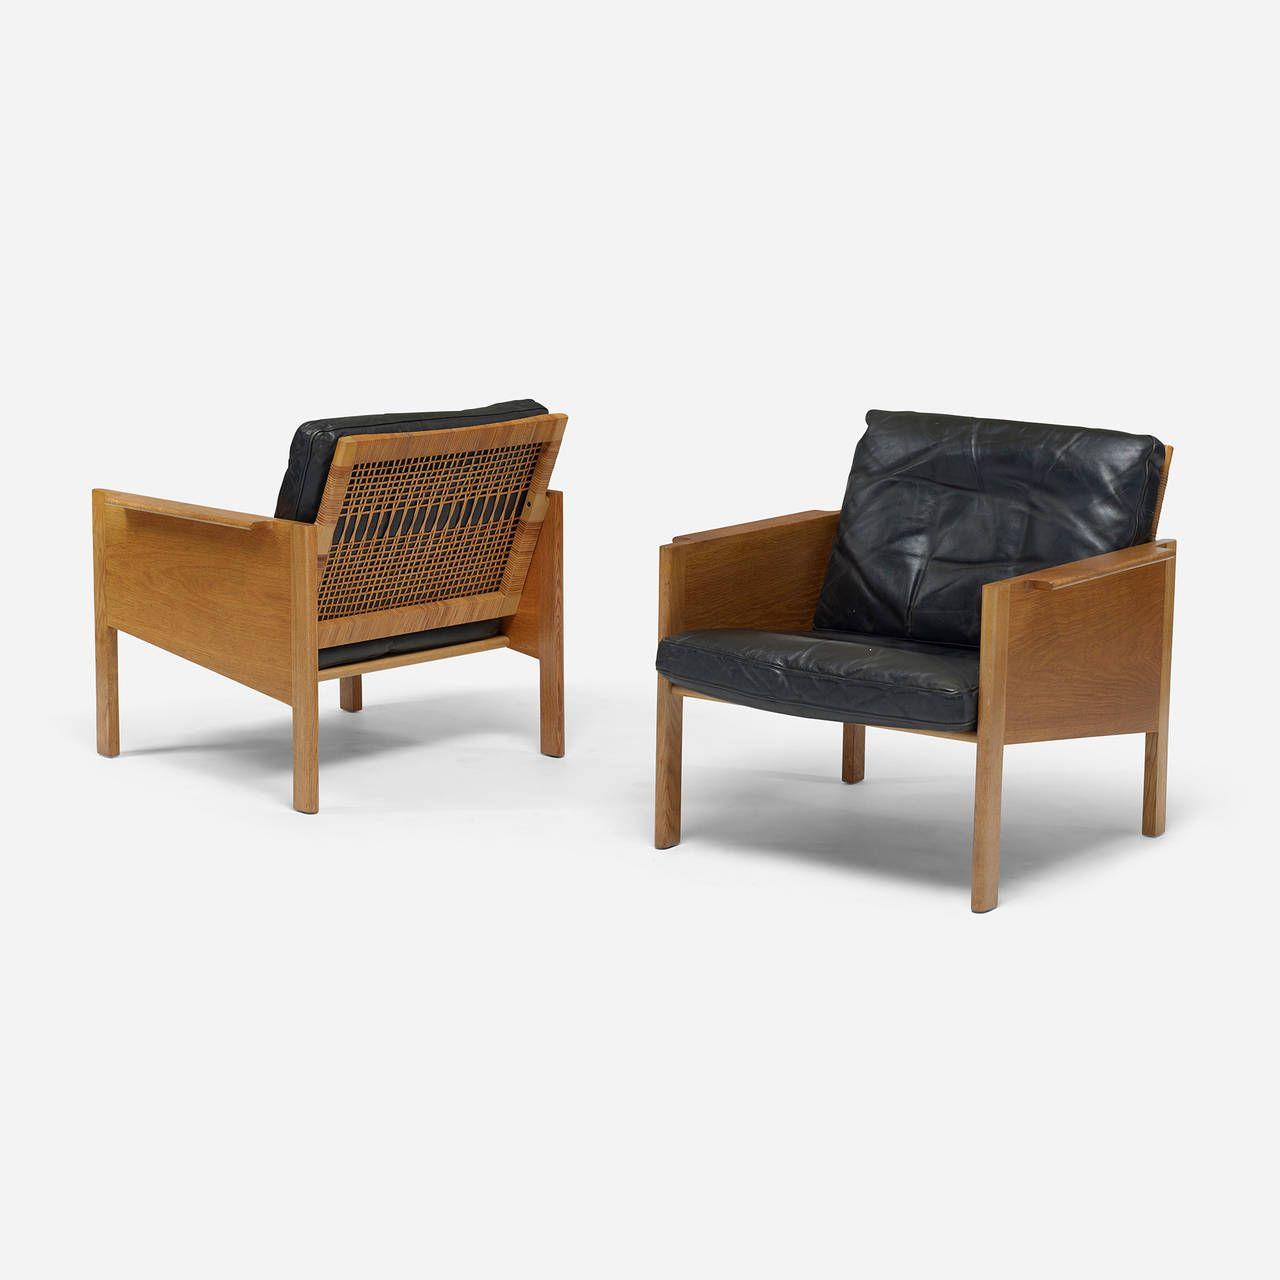 Pair of lounge chairs by kai kristiansen for christian jensen møbelsnedkeri